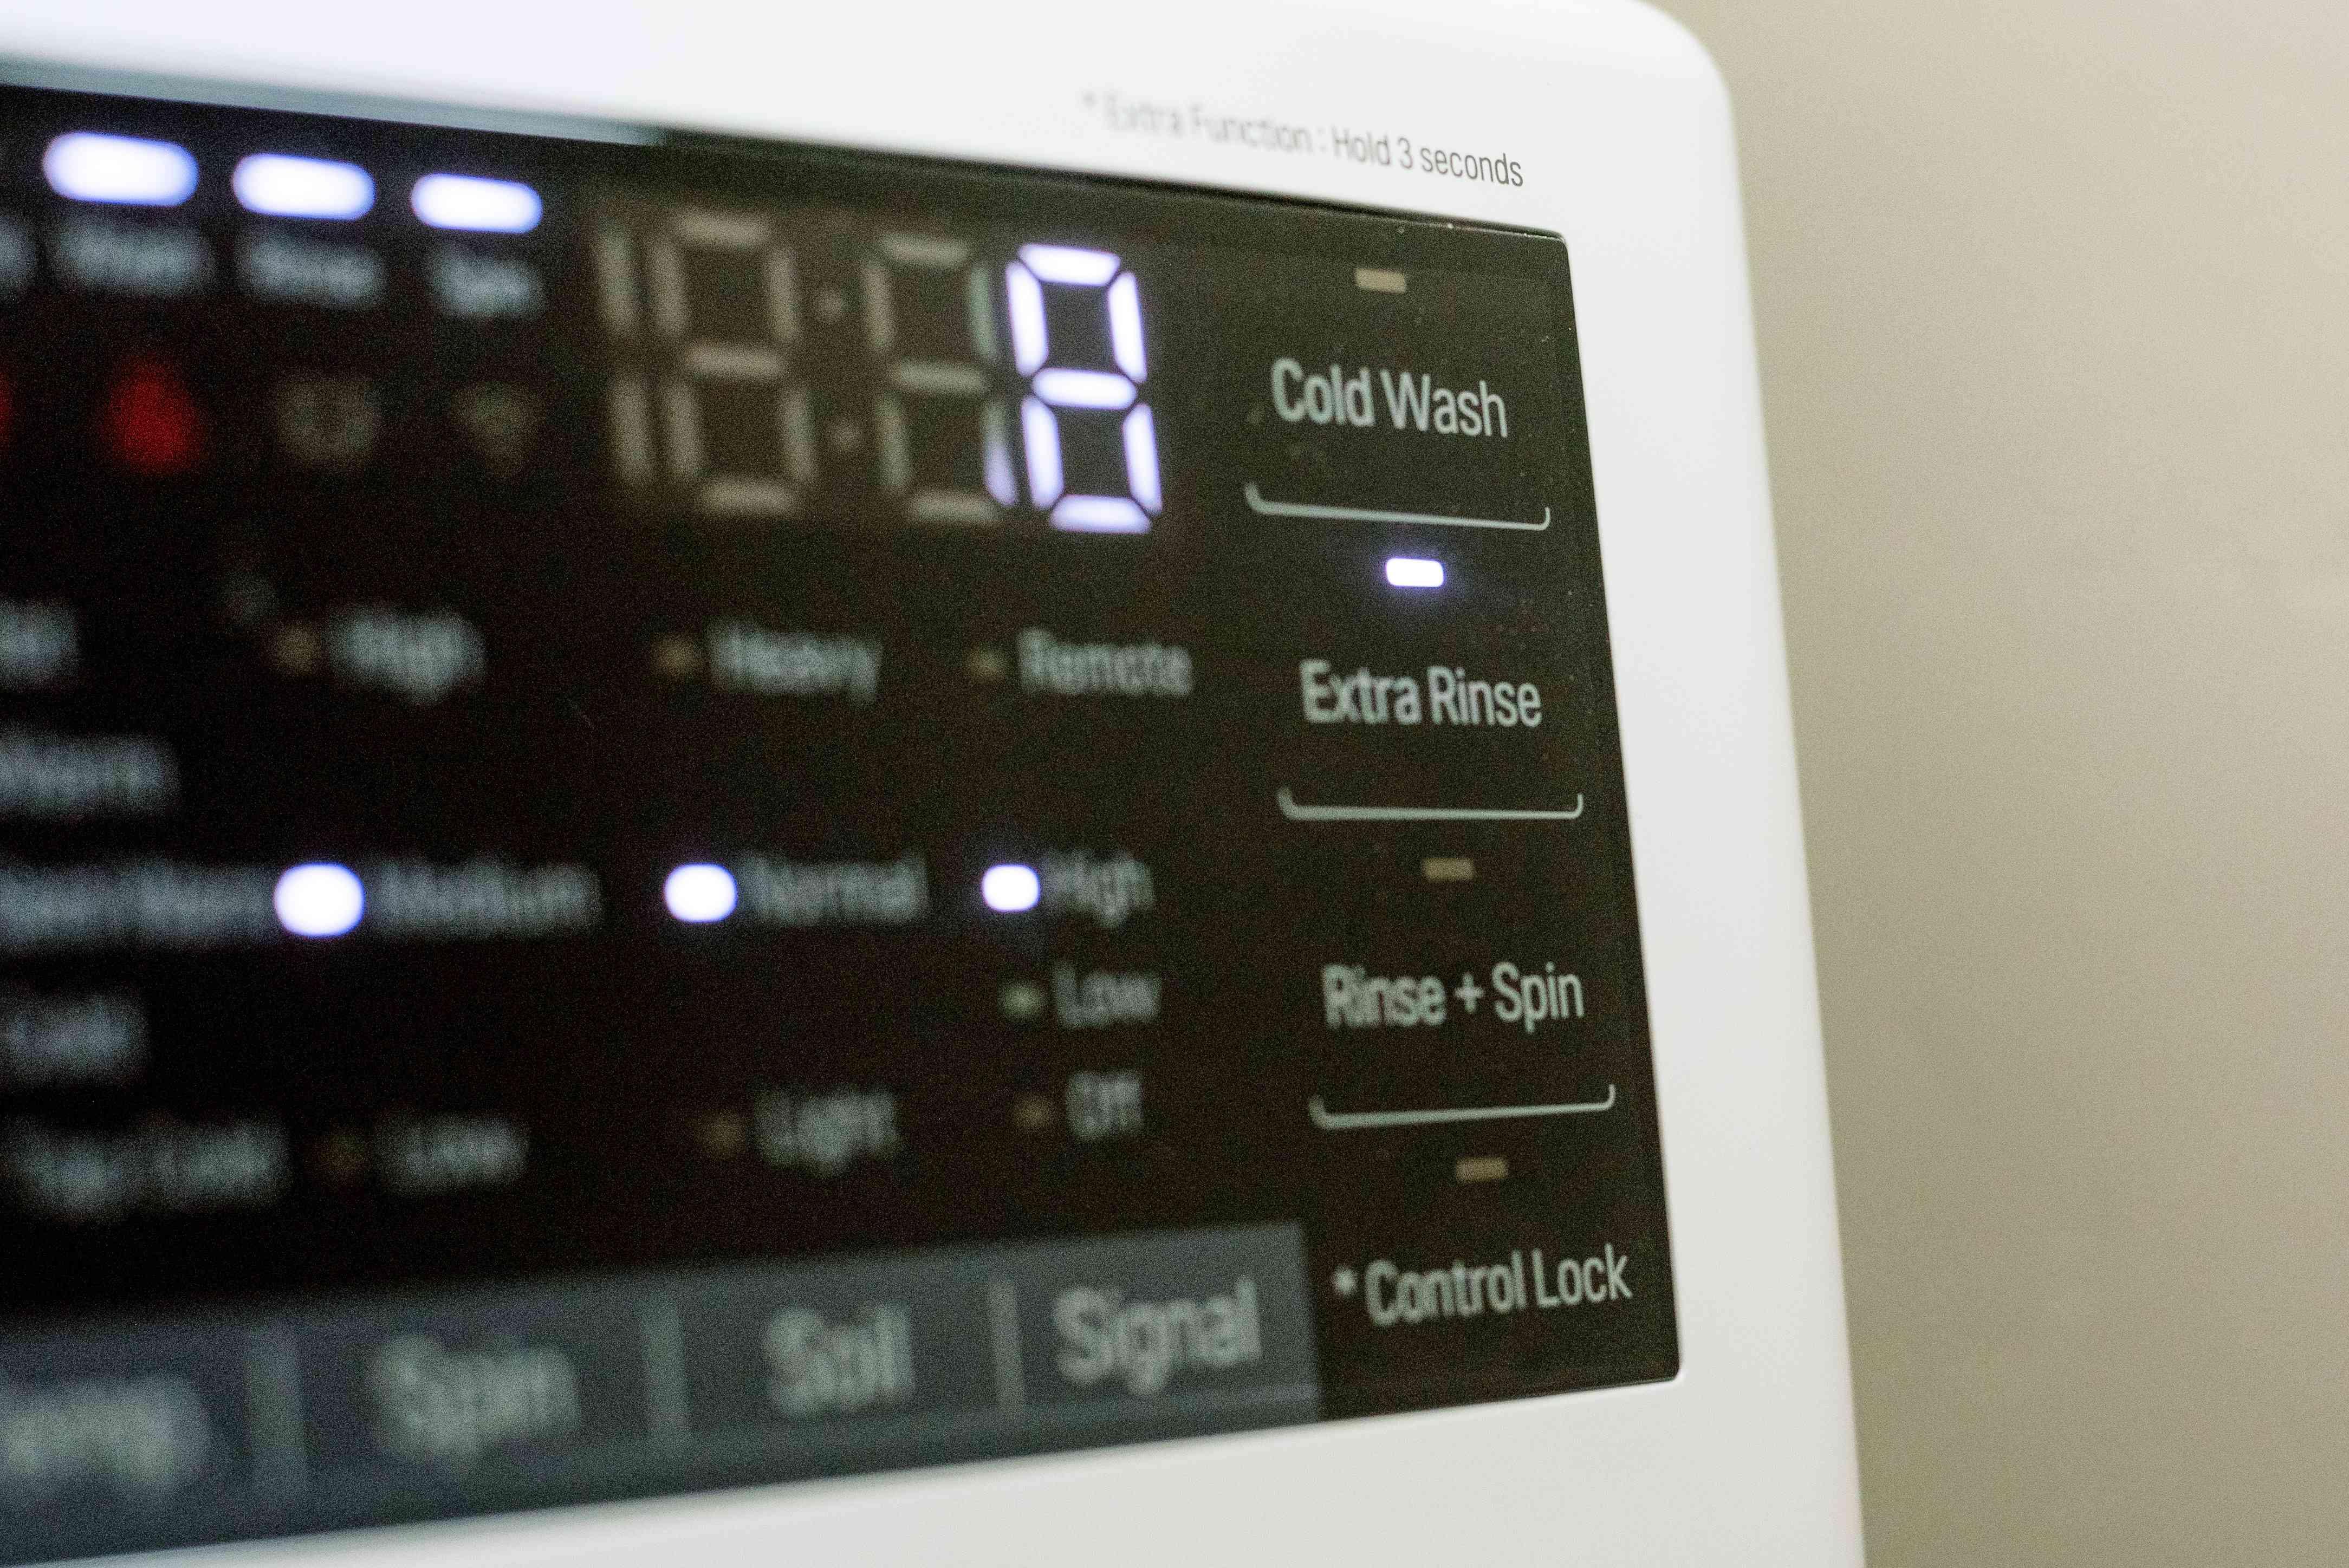 Control panel of a washing machine